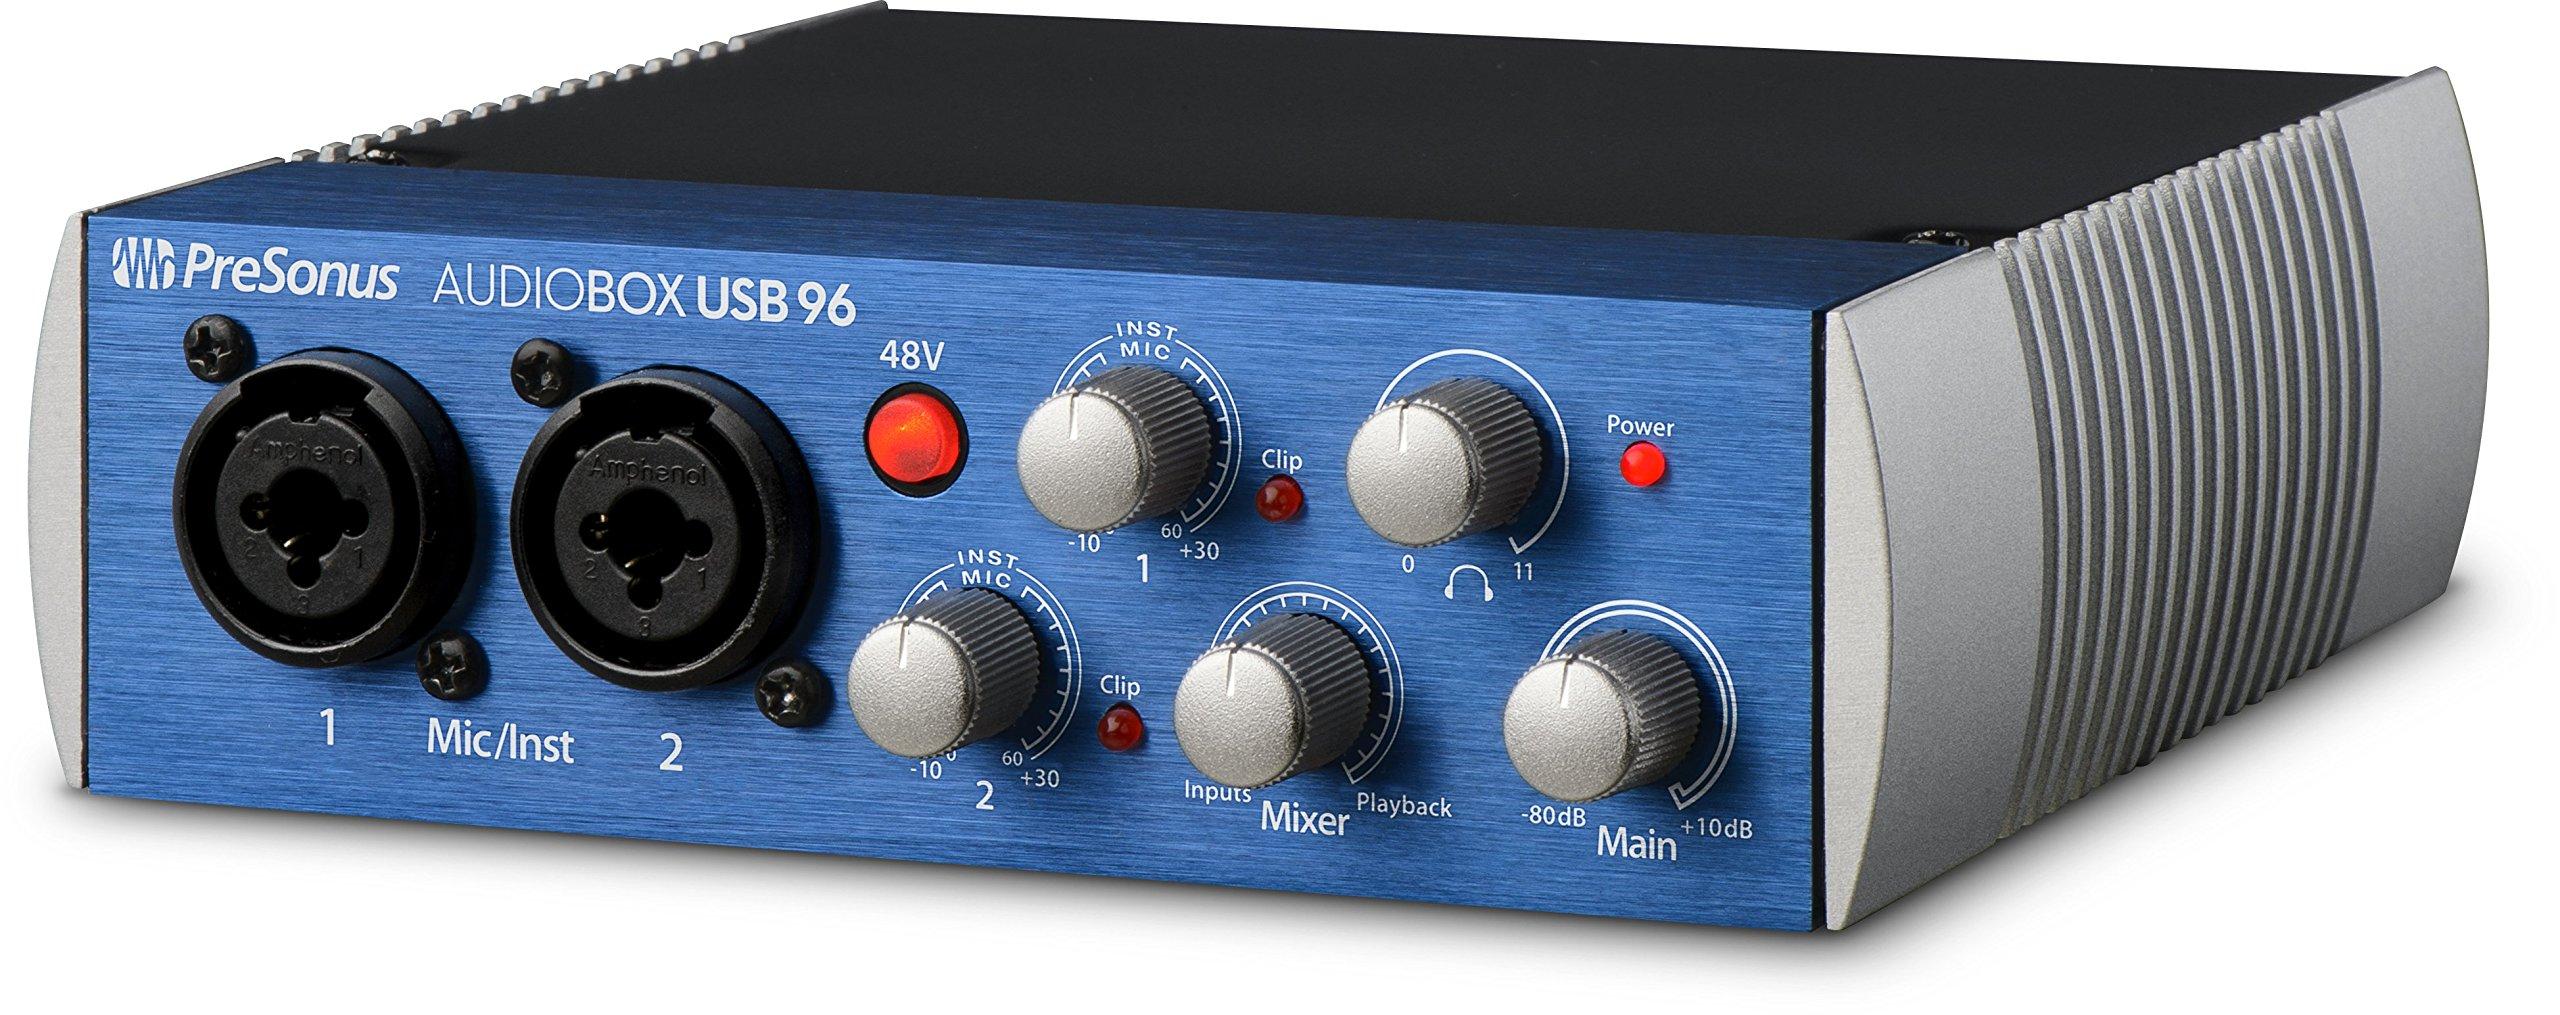 PreSonus AudioBox USB 96 2x2 USB Audio Interface by PreSonus